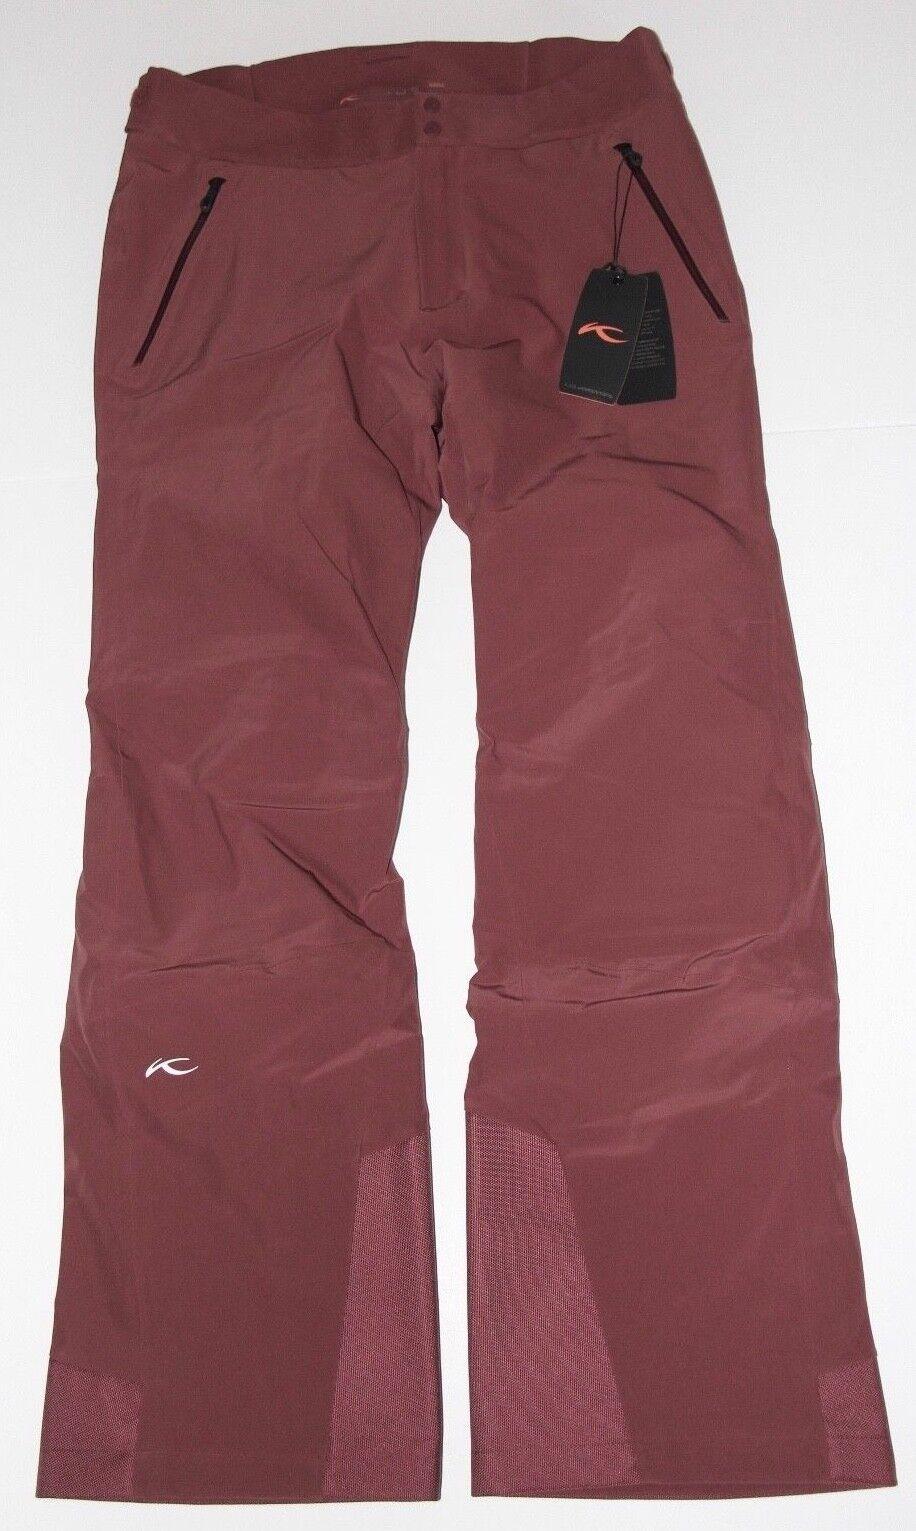 KJUS Men's Formula Ski Pants - Size 50  Medium (US 34) - Rum (60900) - NEW  more affordable